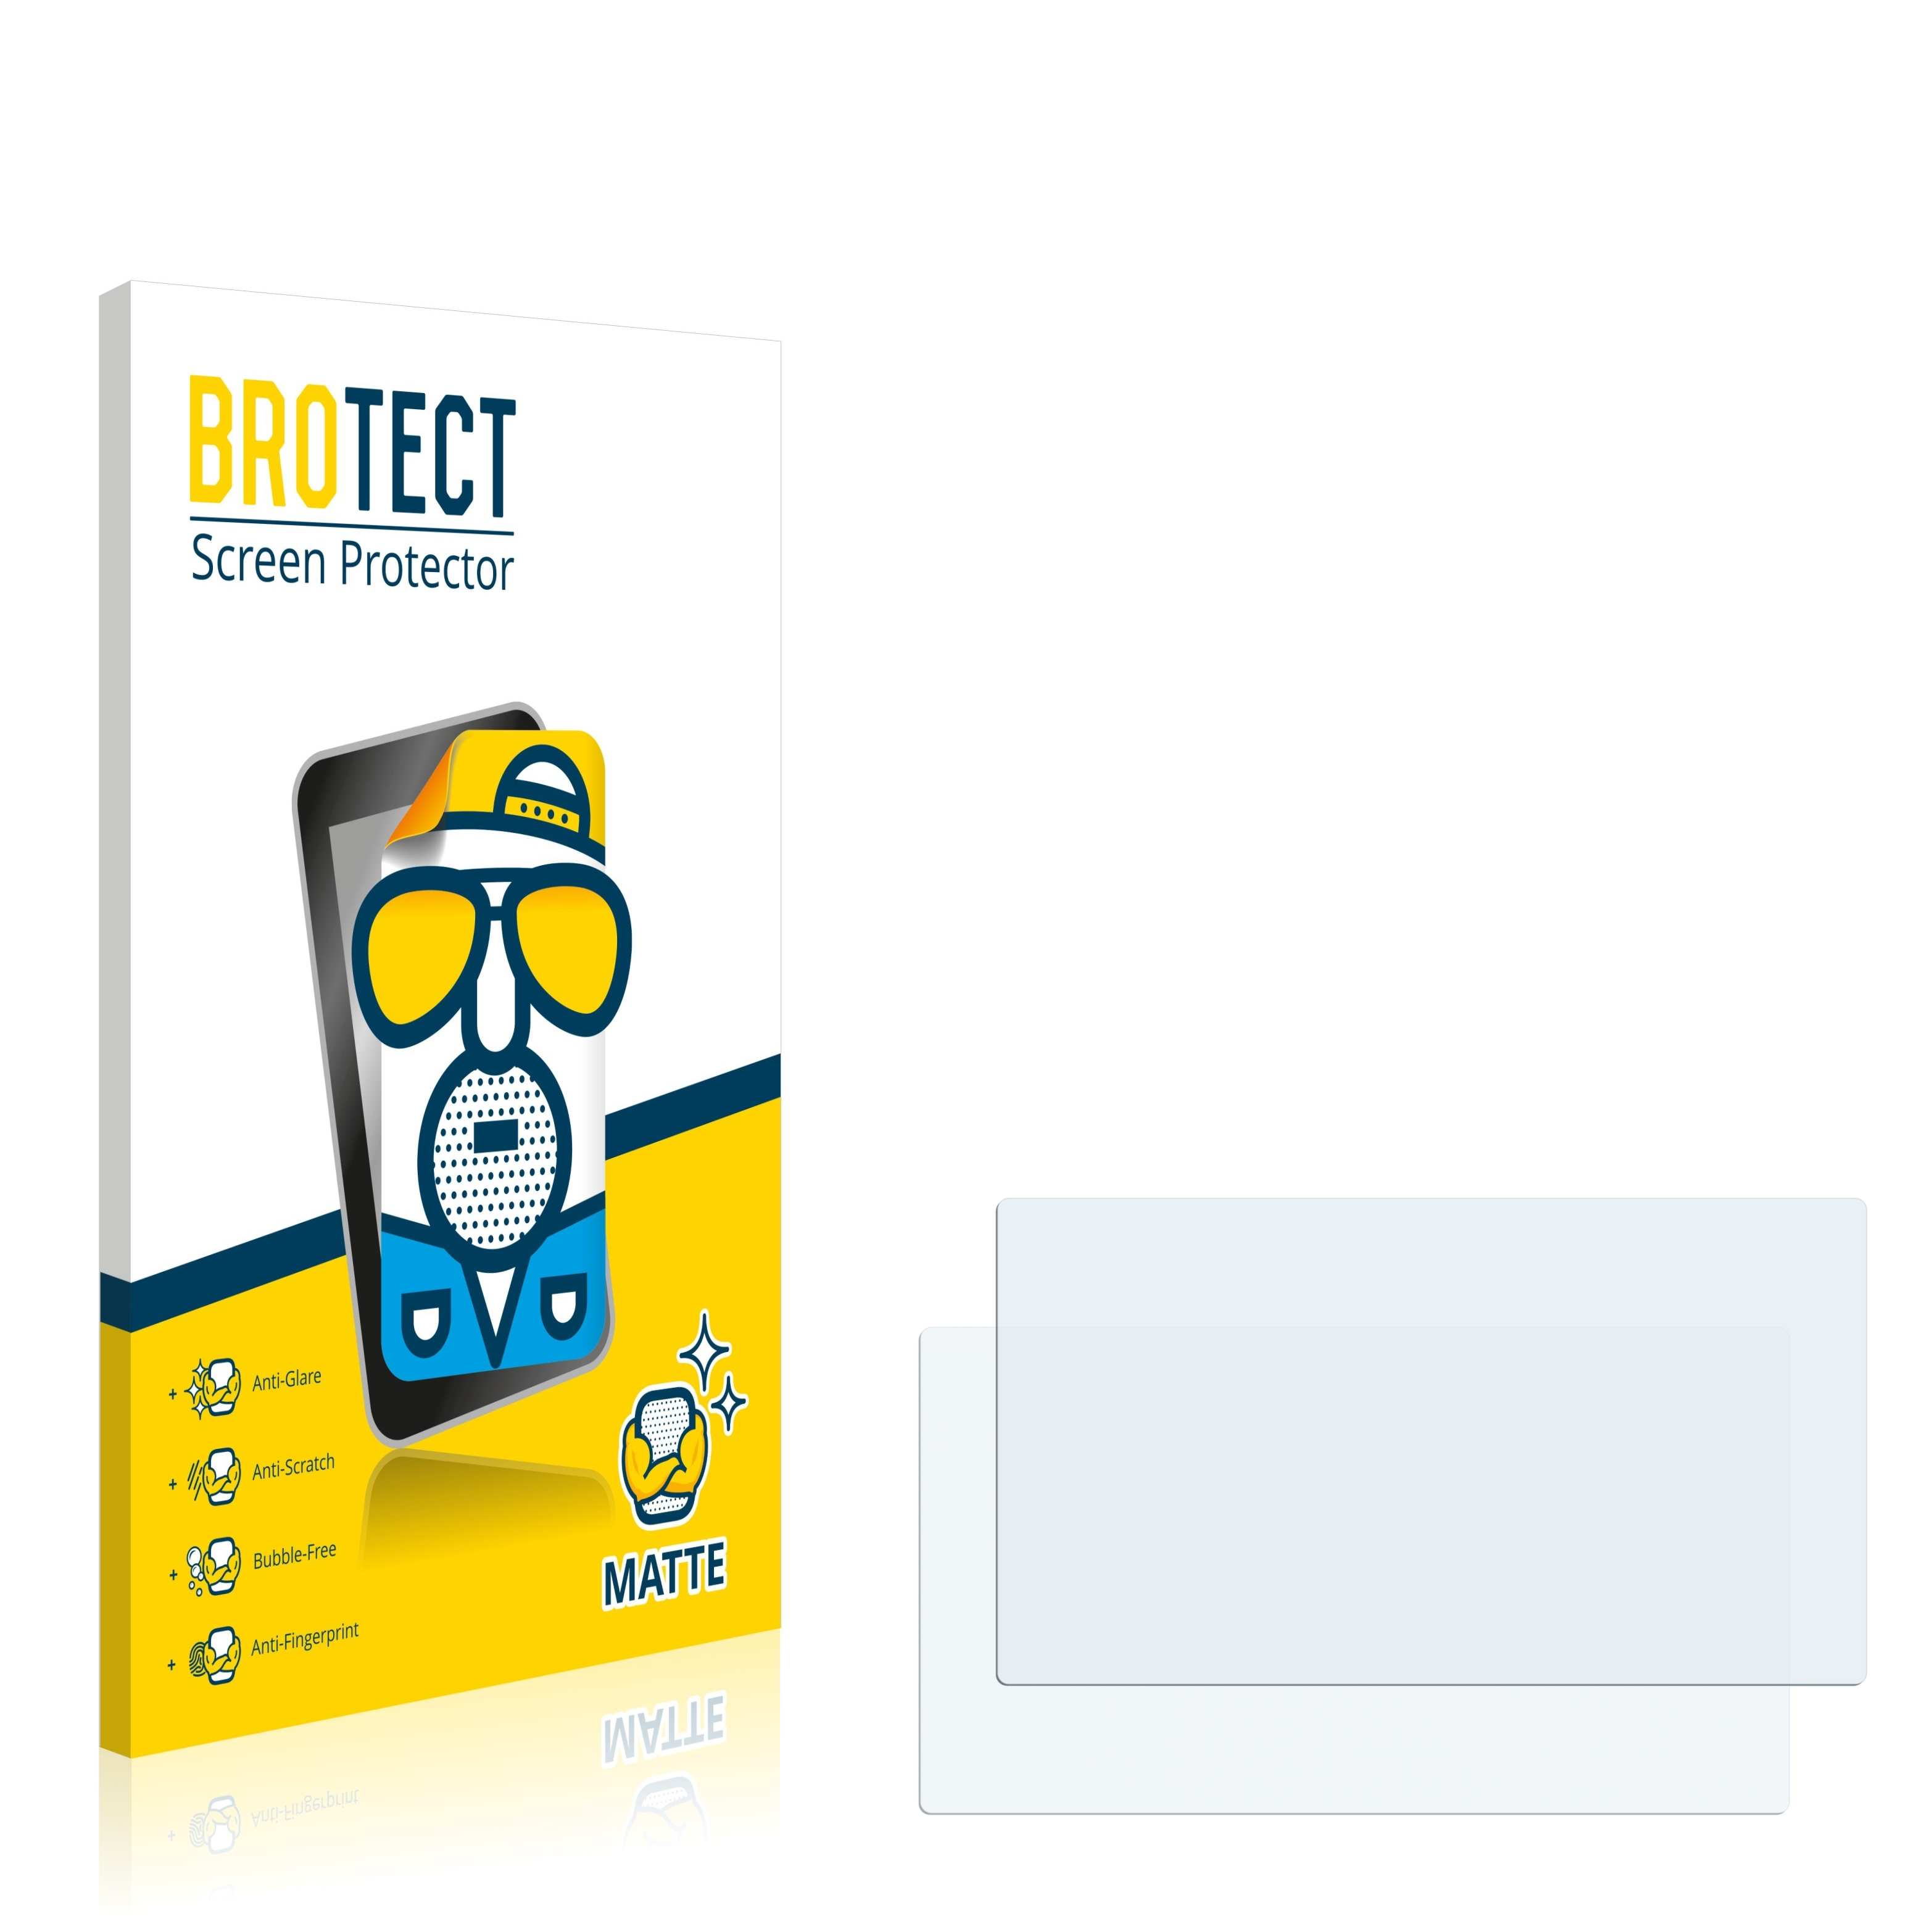 Matná ochranná fólie BROTECT pro Snooper S6400 Ventura Pro, 2 ks